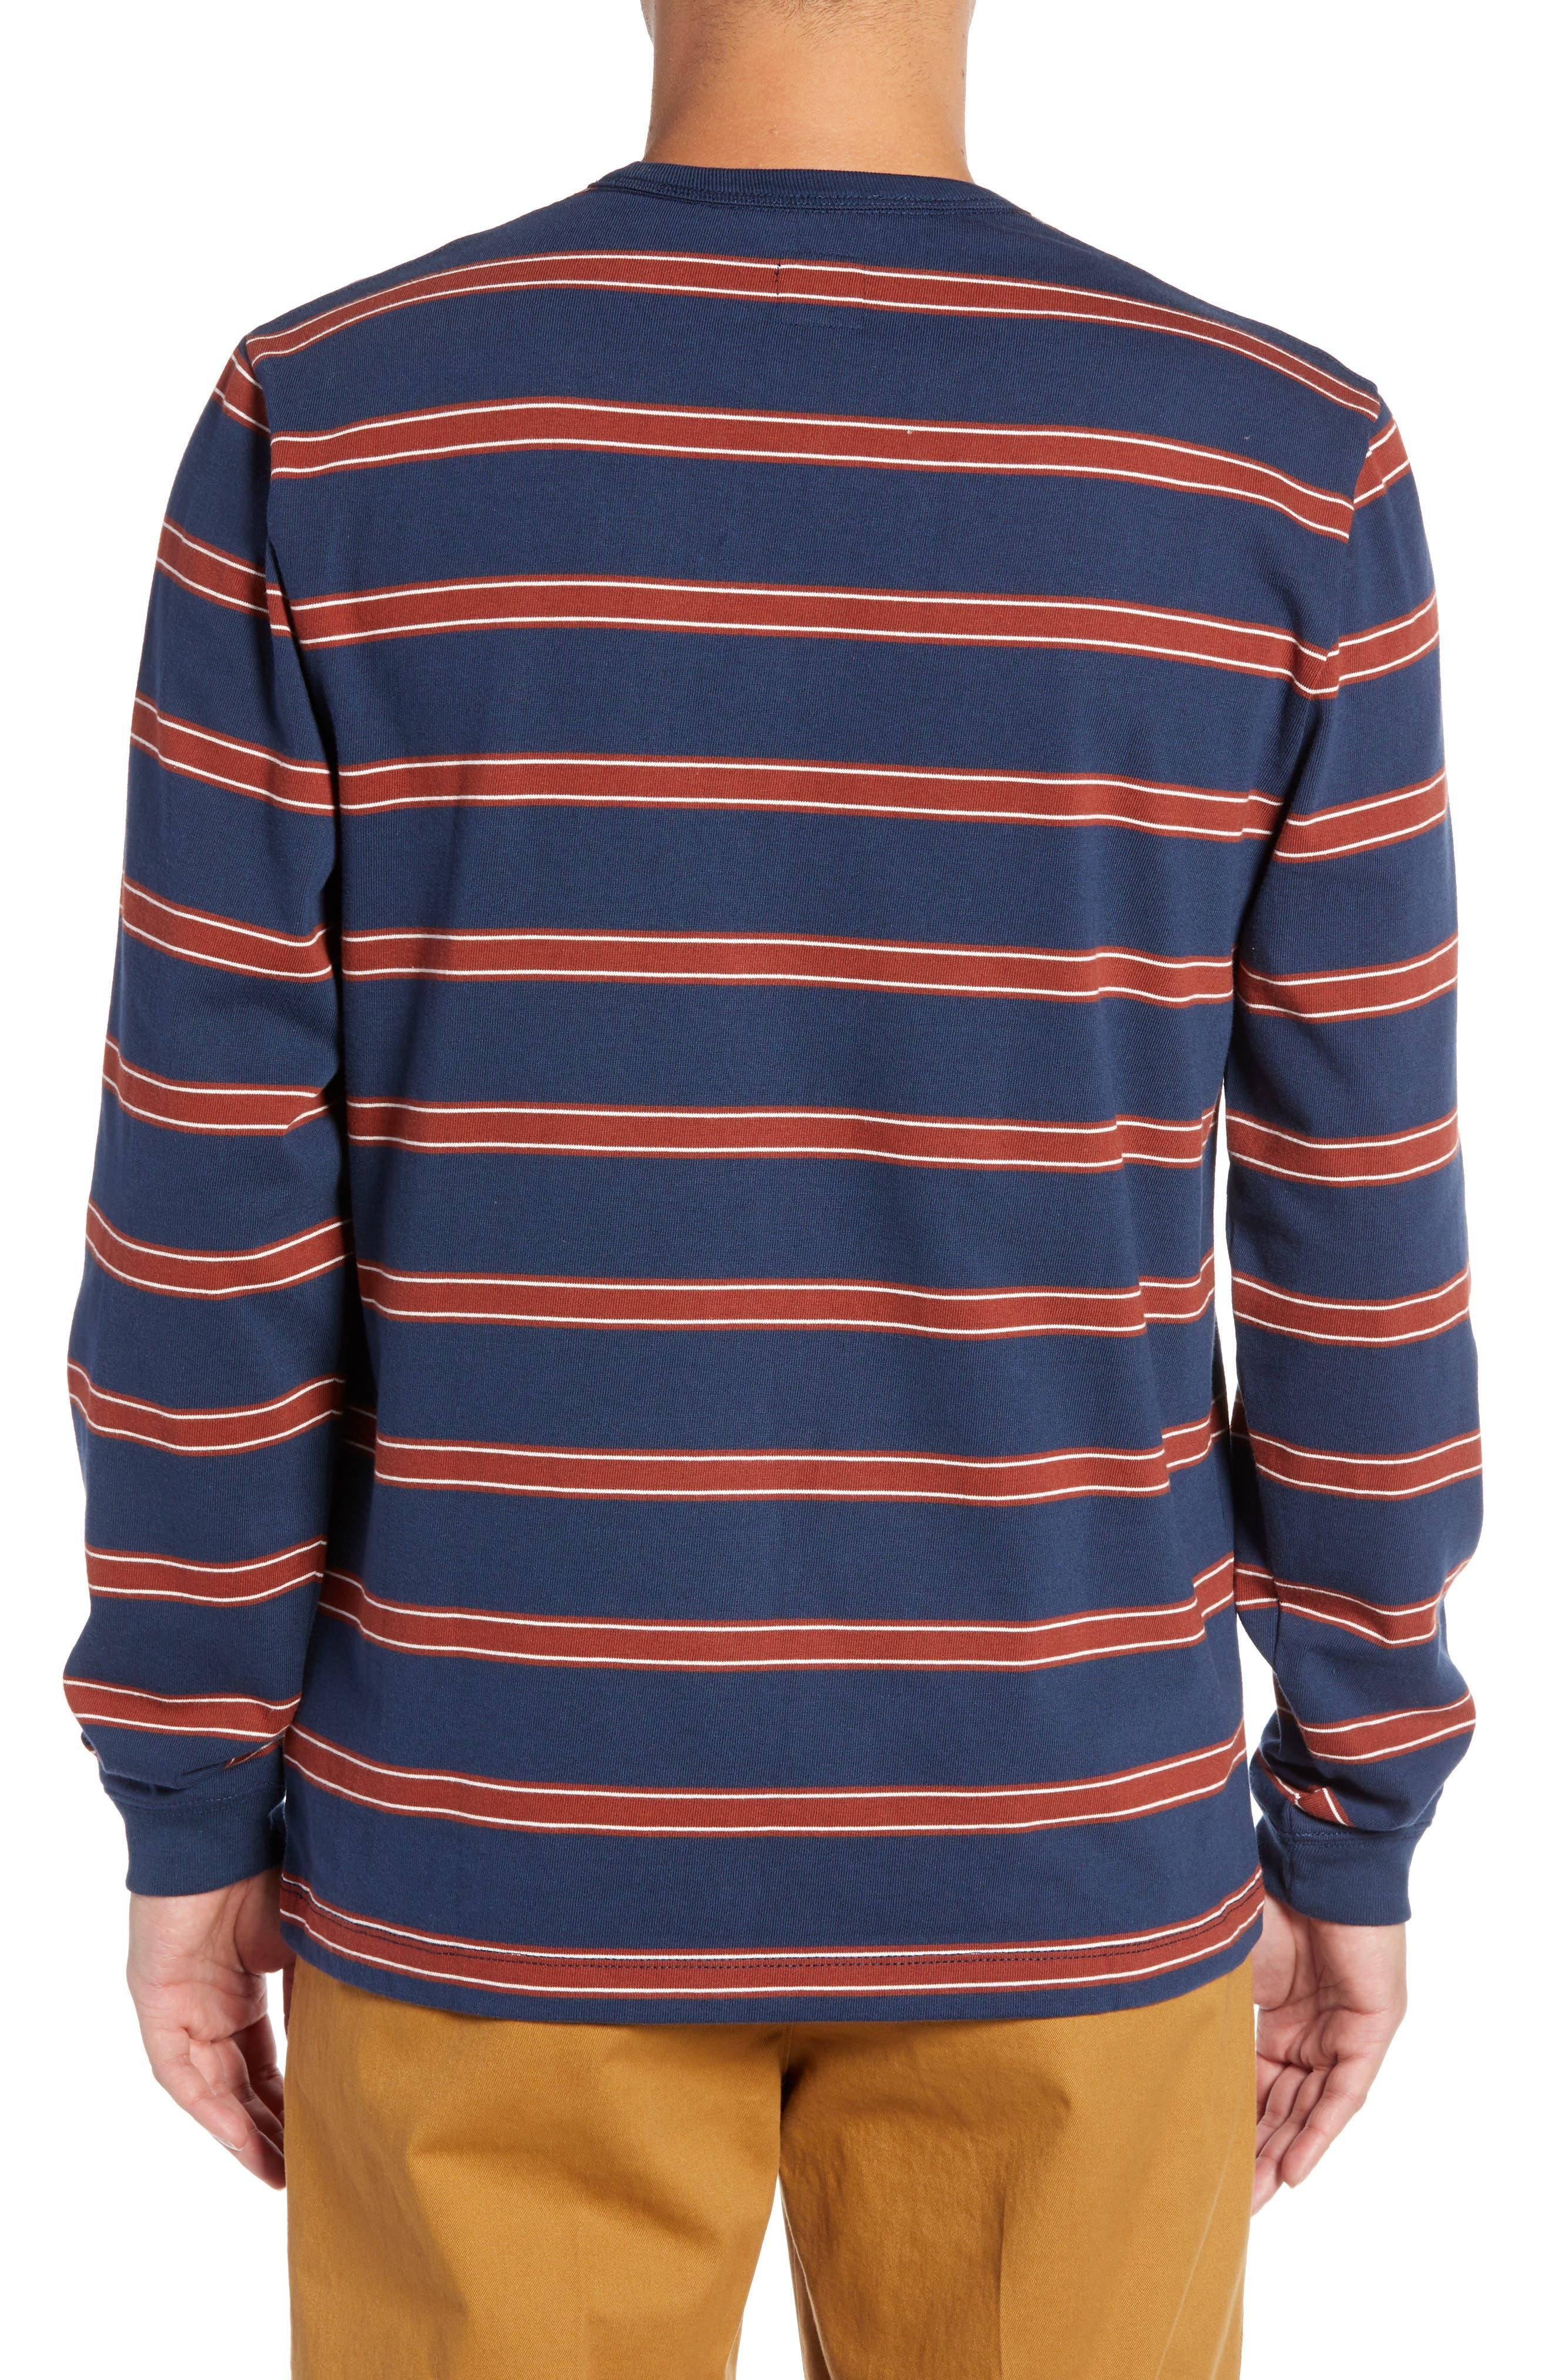 Watson Striped Long Sleeve T-Shirt,                             Alternate thumbnail 2, color,                             DRESS BLUES